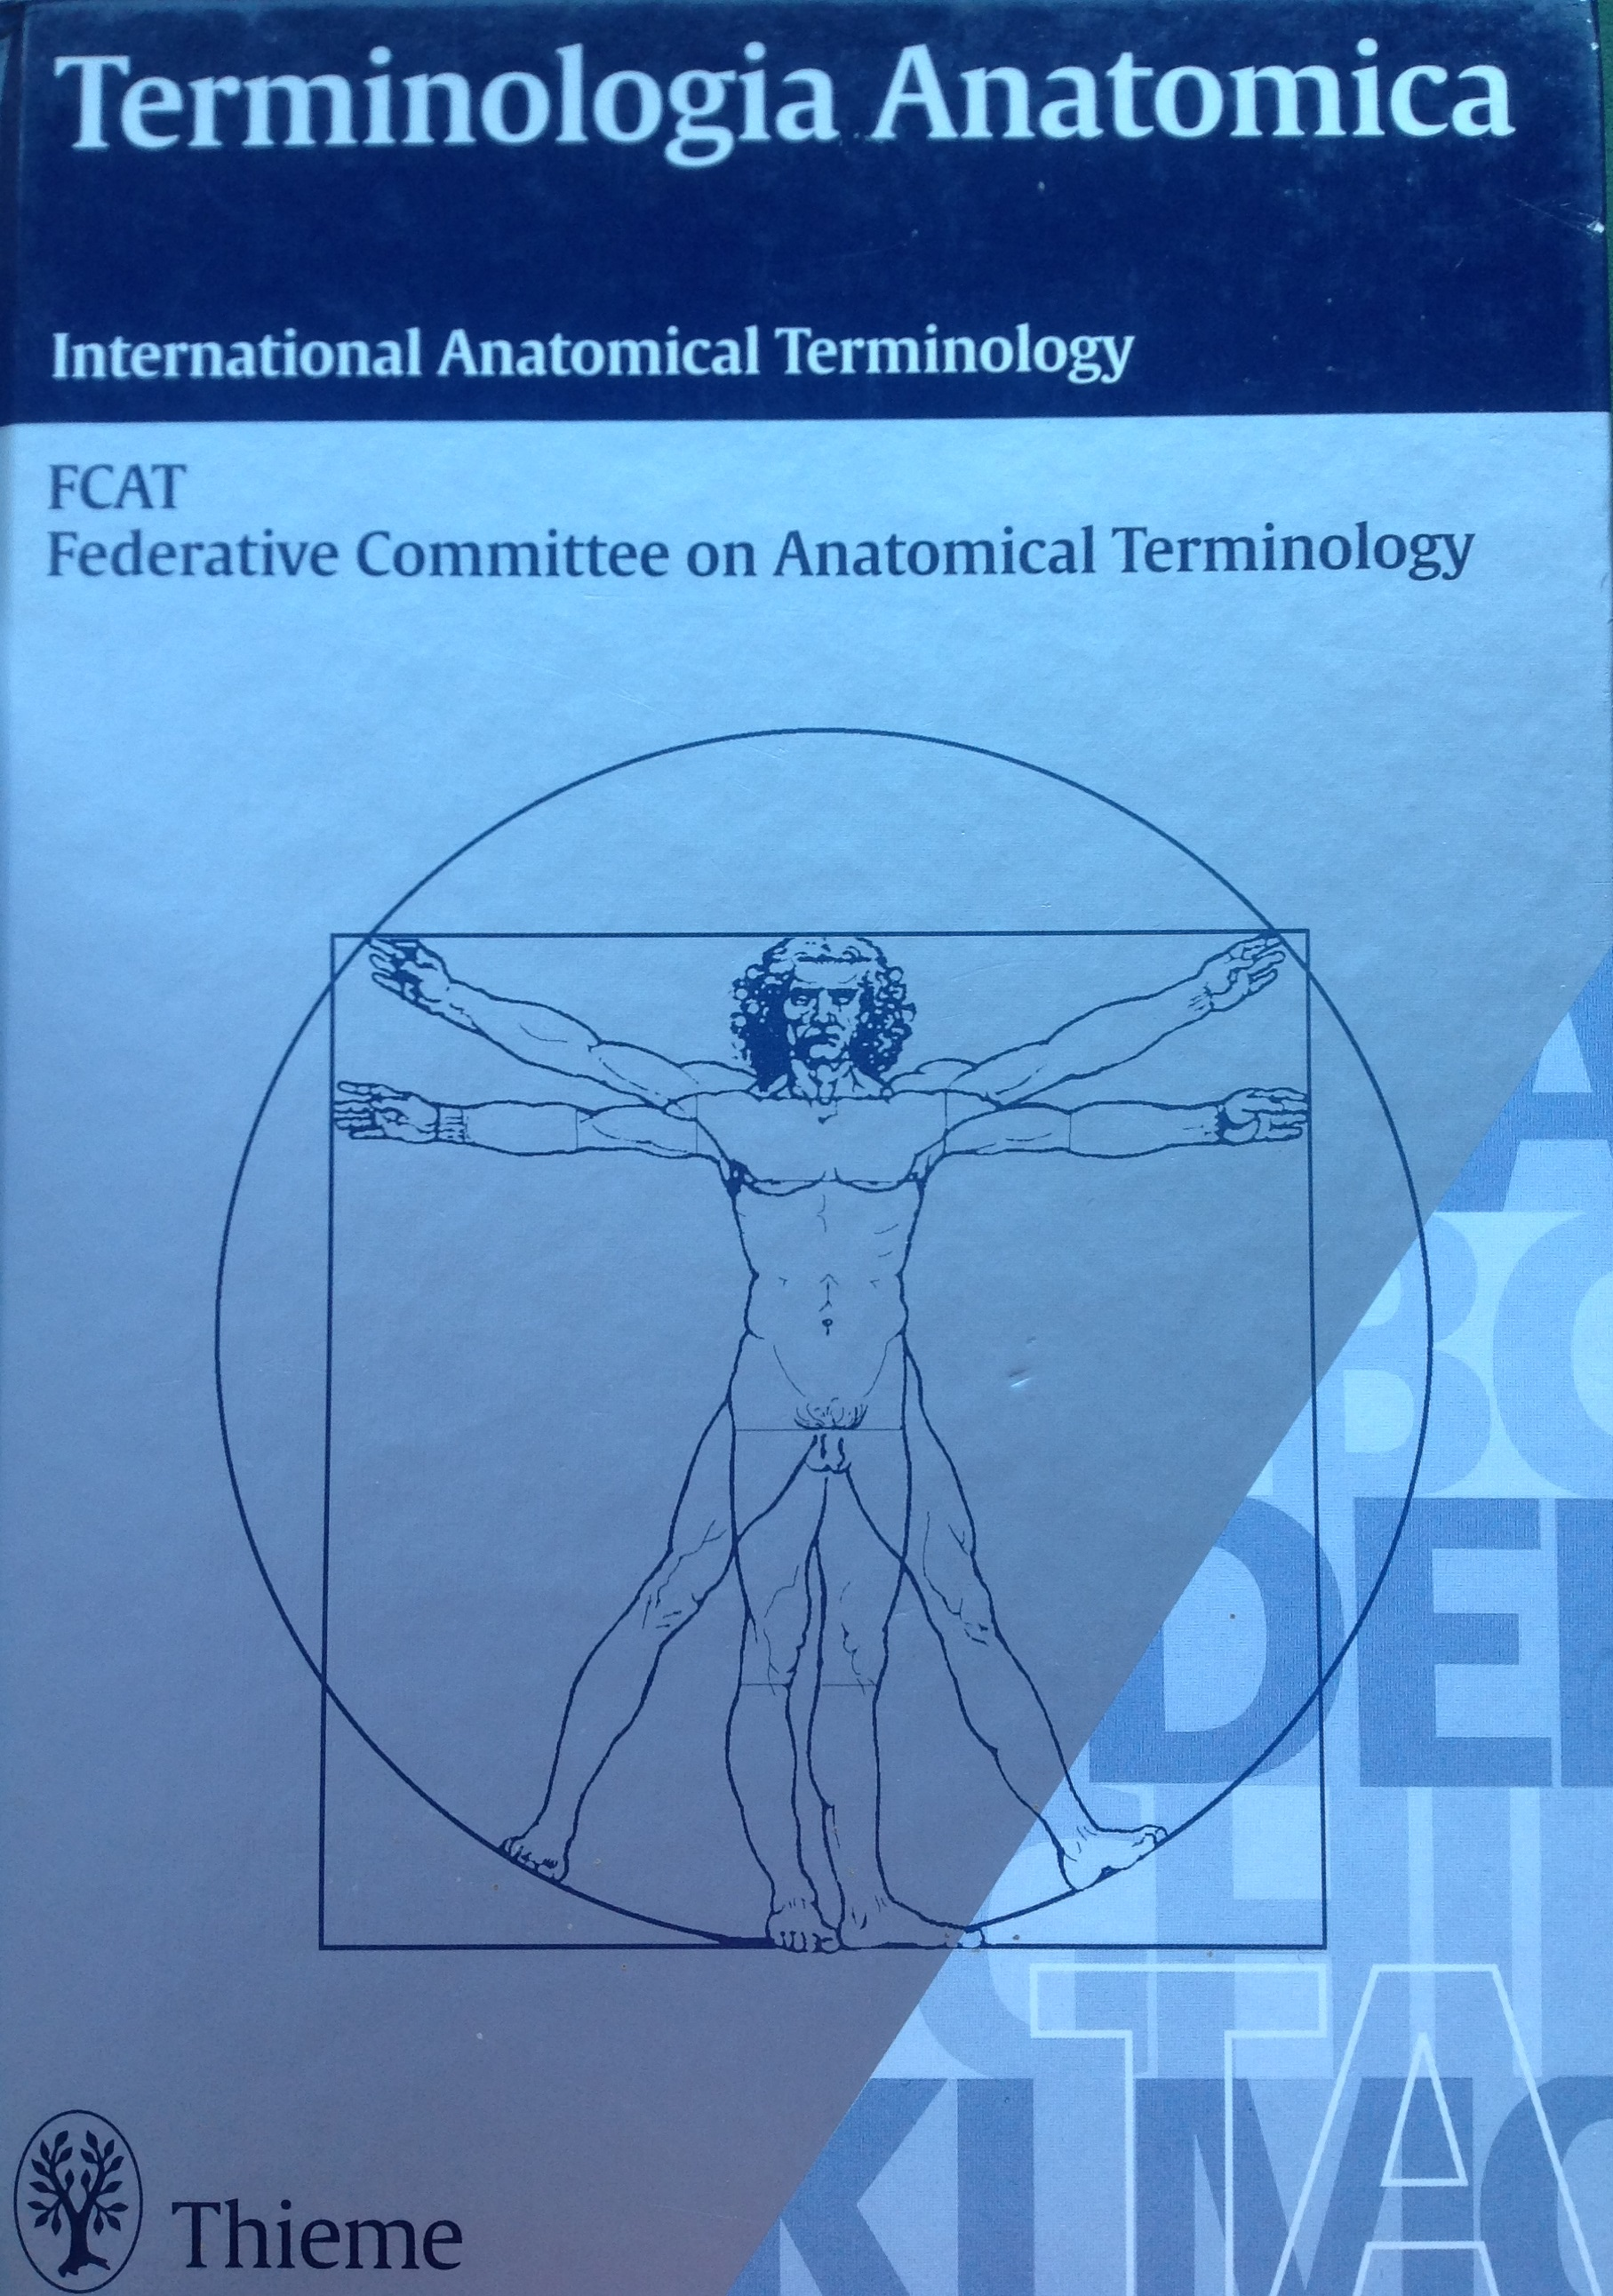 Terminologia Anatomica (1998)